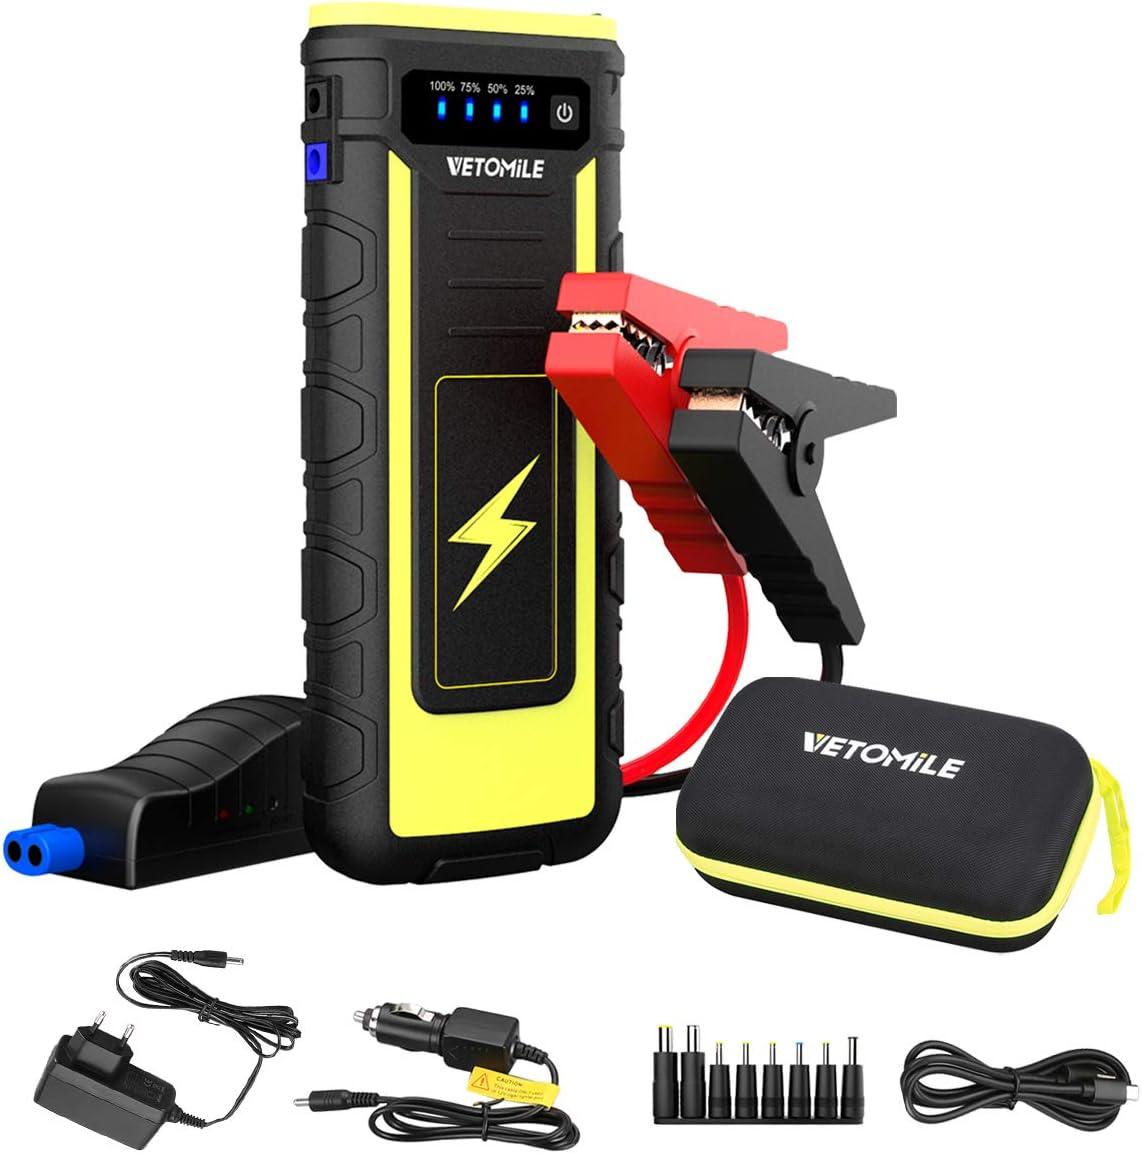 Vetomile Auto Starthilfe Powerbank 21000mah Für 12v Elektronik